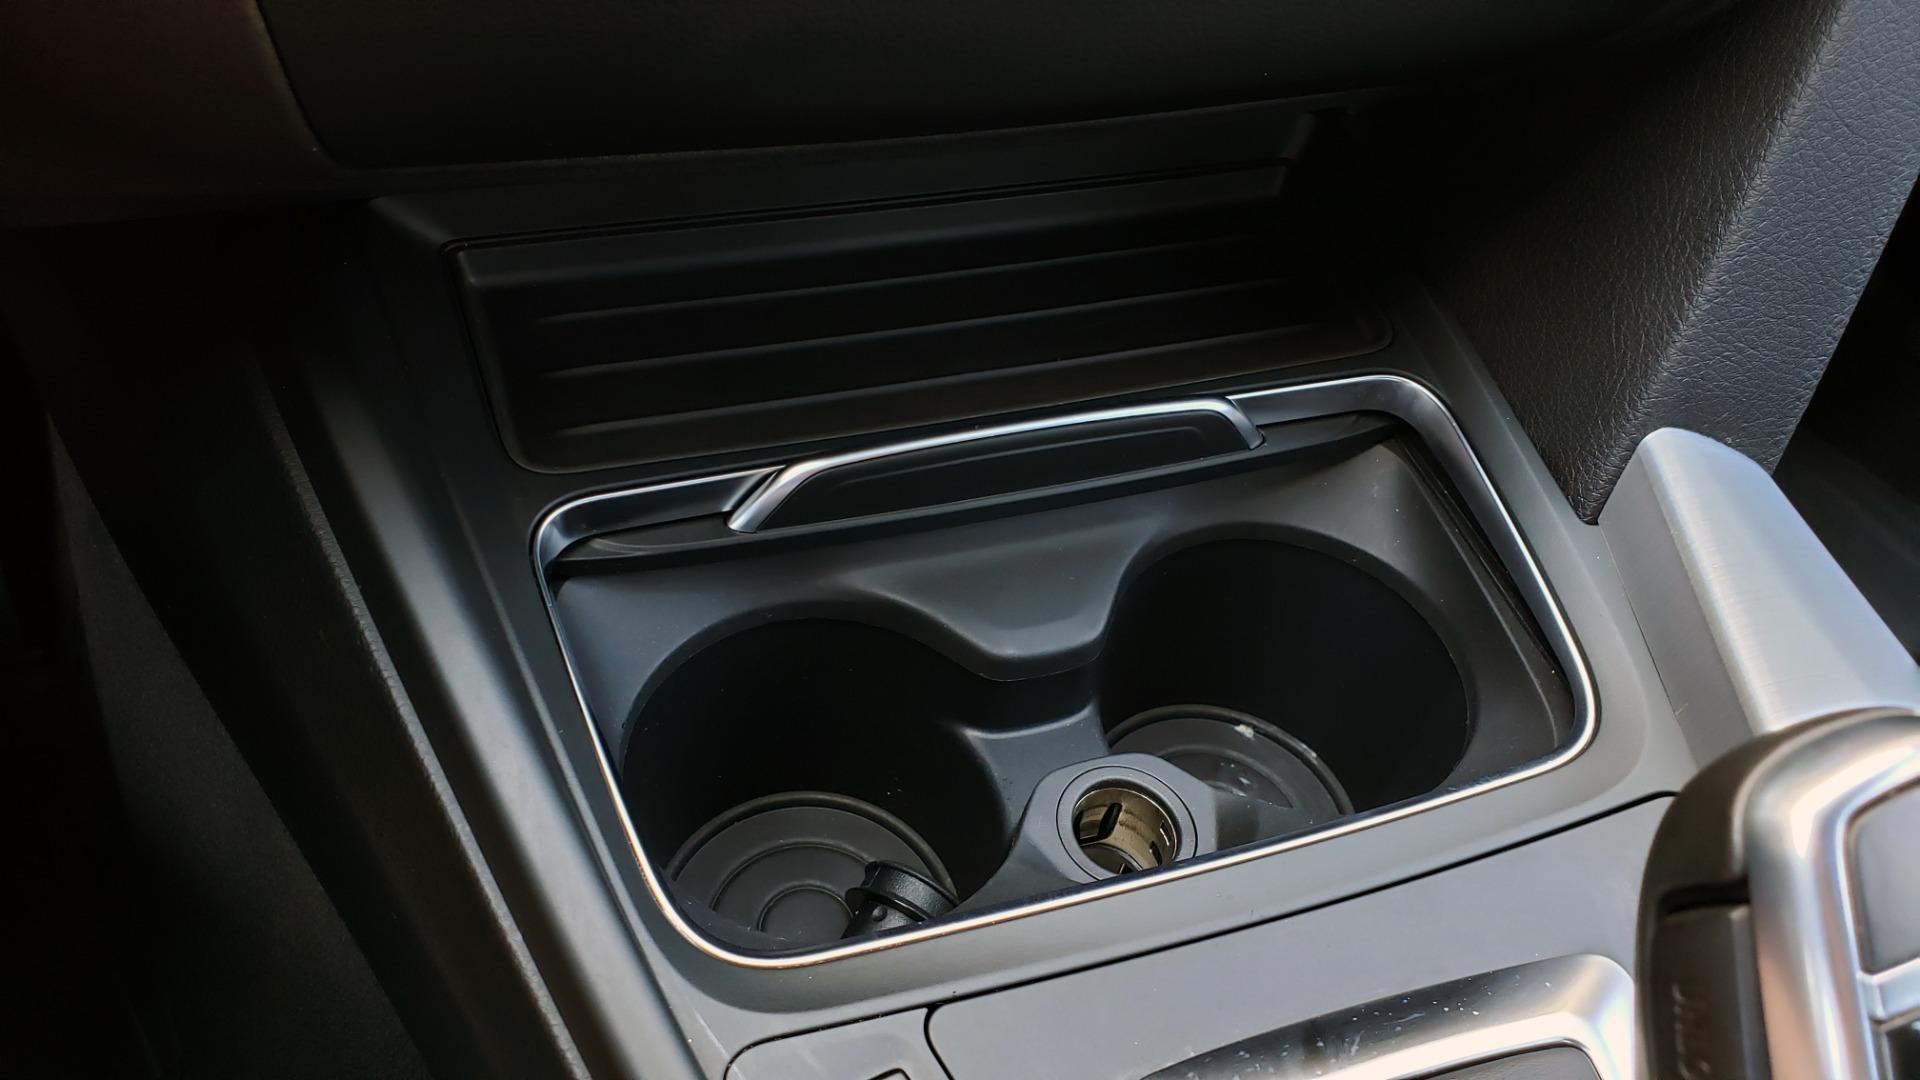 Used 2017 BMW 3 SERIES 330I SPORT SEDAN / DRVR ASST PKG / SUNROOF / REARVIEW for sale Sold at Formula Imports in Charlotte NC 28227 48